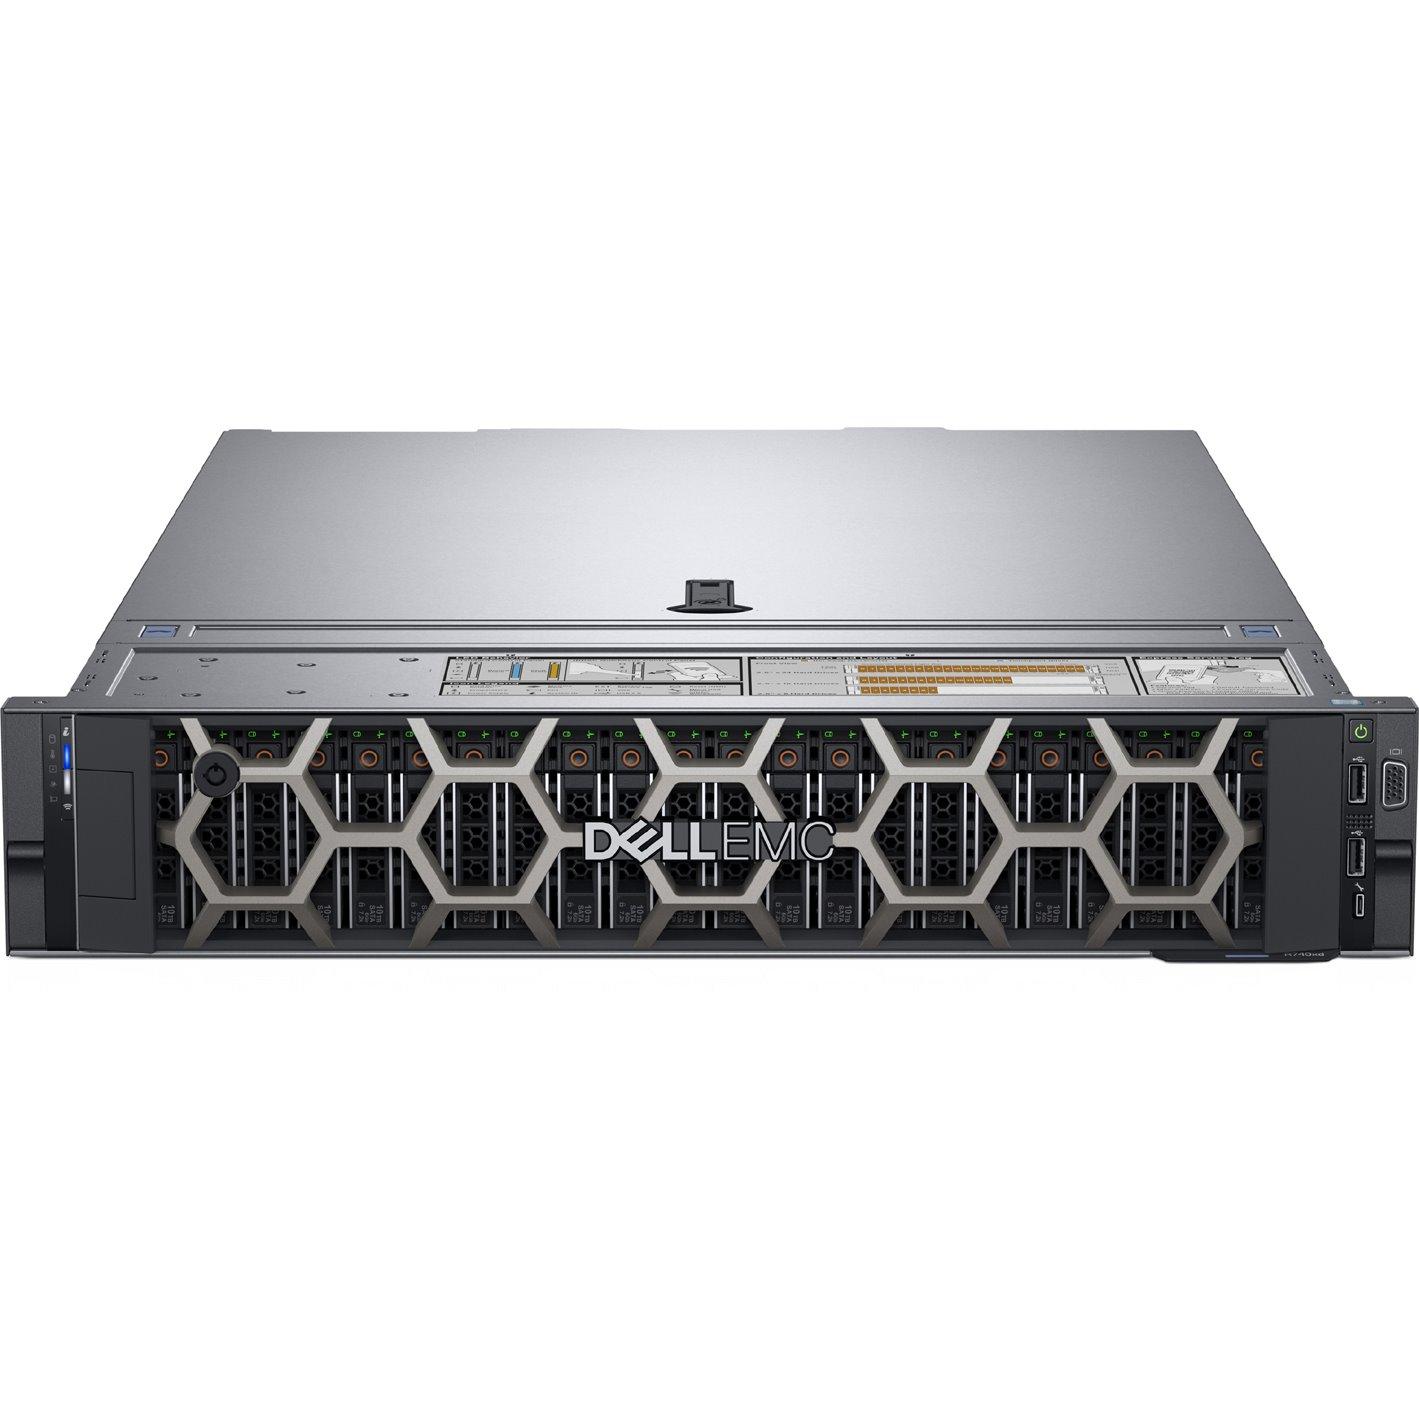 Dell EMC PowerEdge R740 2U Rack Server - 1 x Intel Xeon Silver 4214 2.20 GHz - 96 GB RAM - 2.40 TB (2 x 1.20 TB) HDD - 12Gb/s SAS, Serial ATA/600 Controller